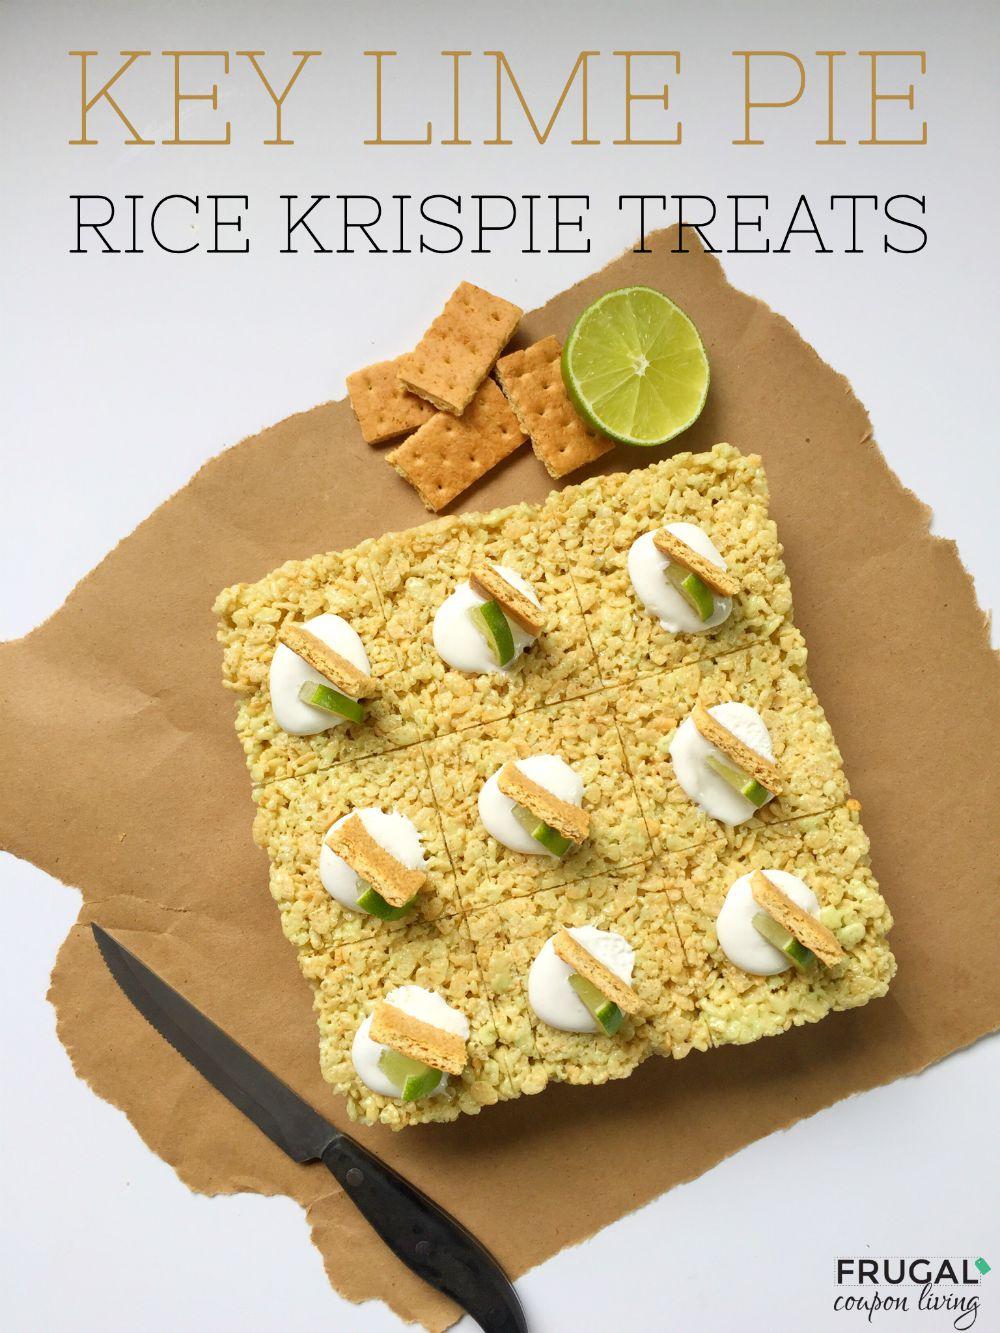 key-lime-pie-rice-krispie-treats-frugal-coupon-living-1000